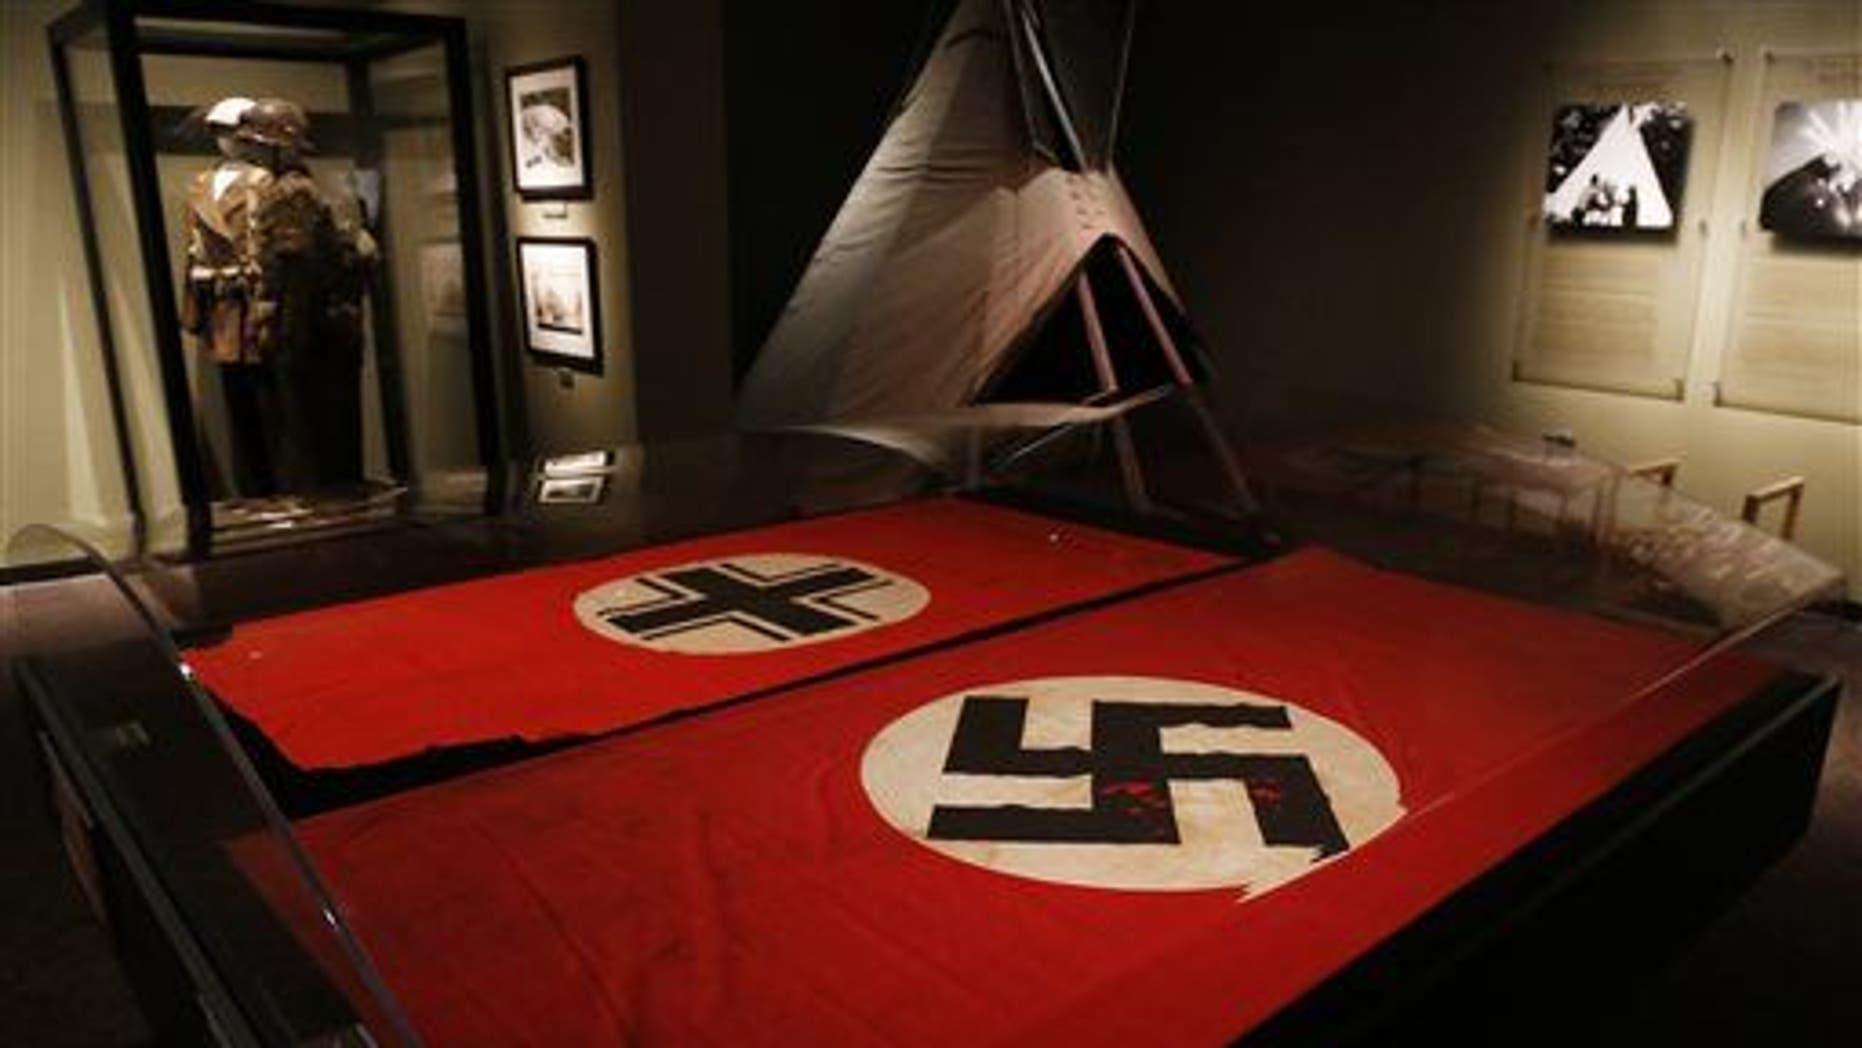 A Nazi German flag with the swastika.